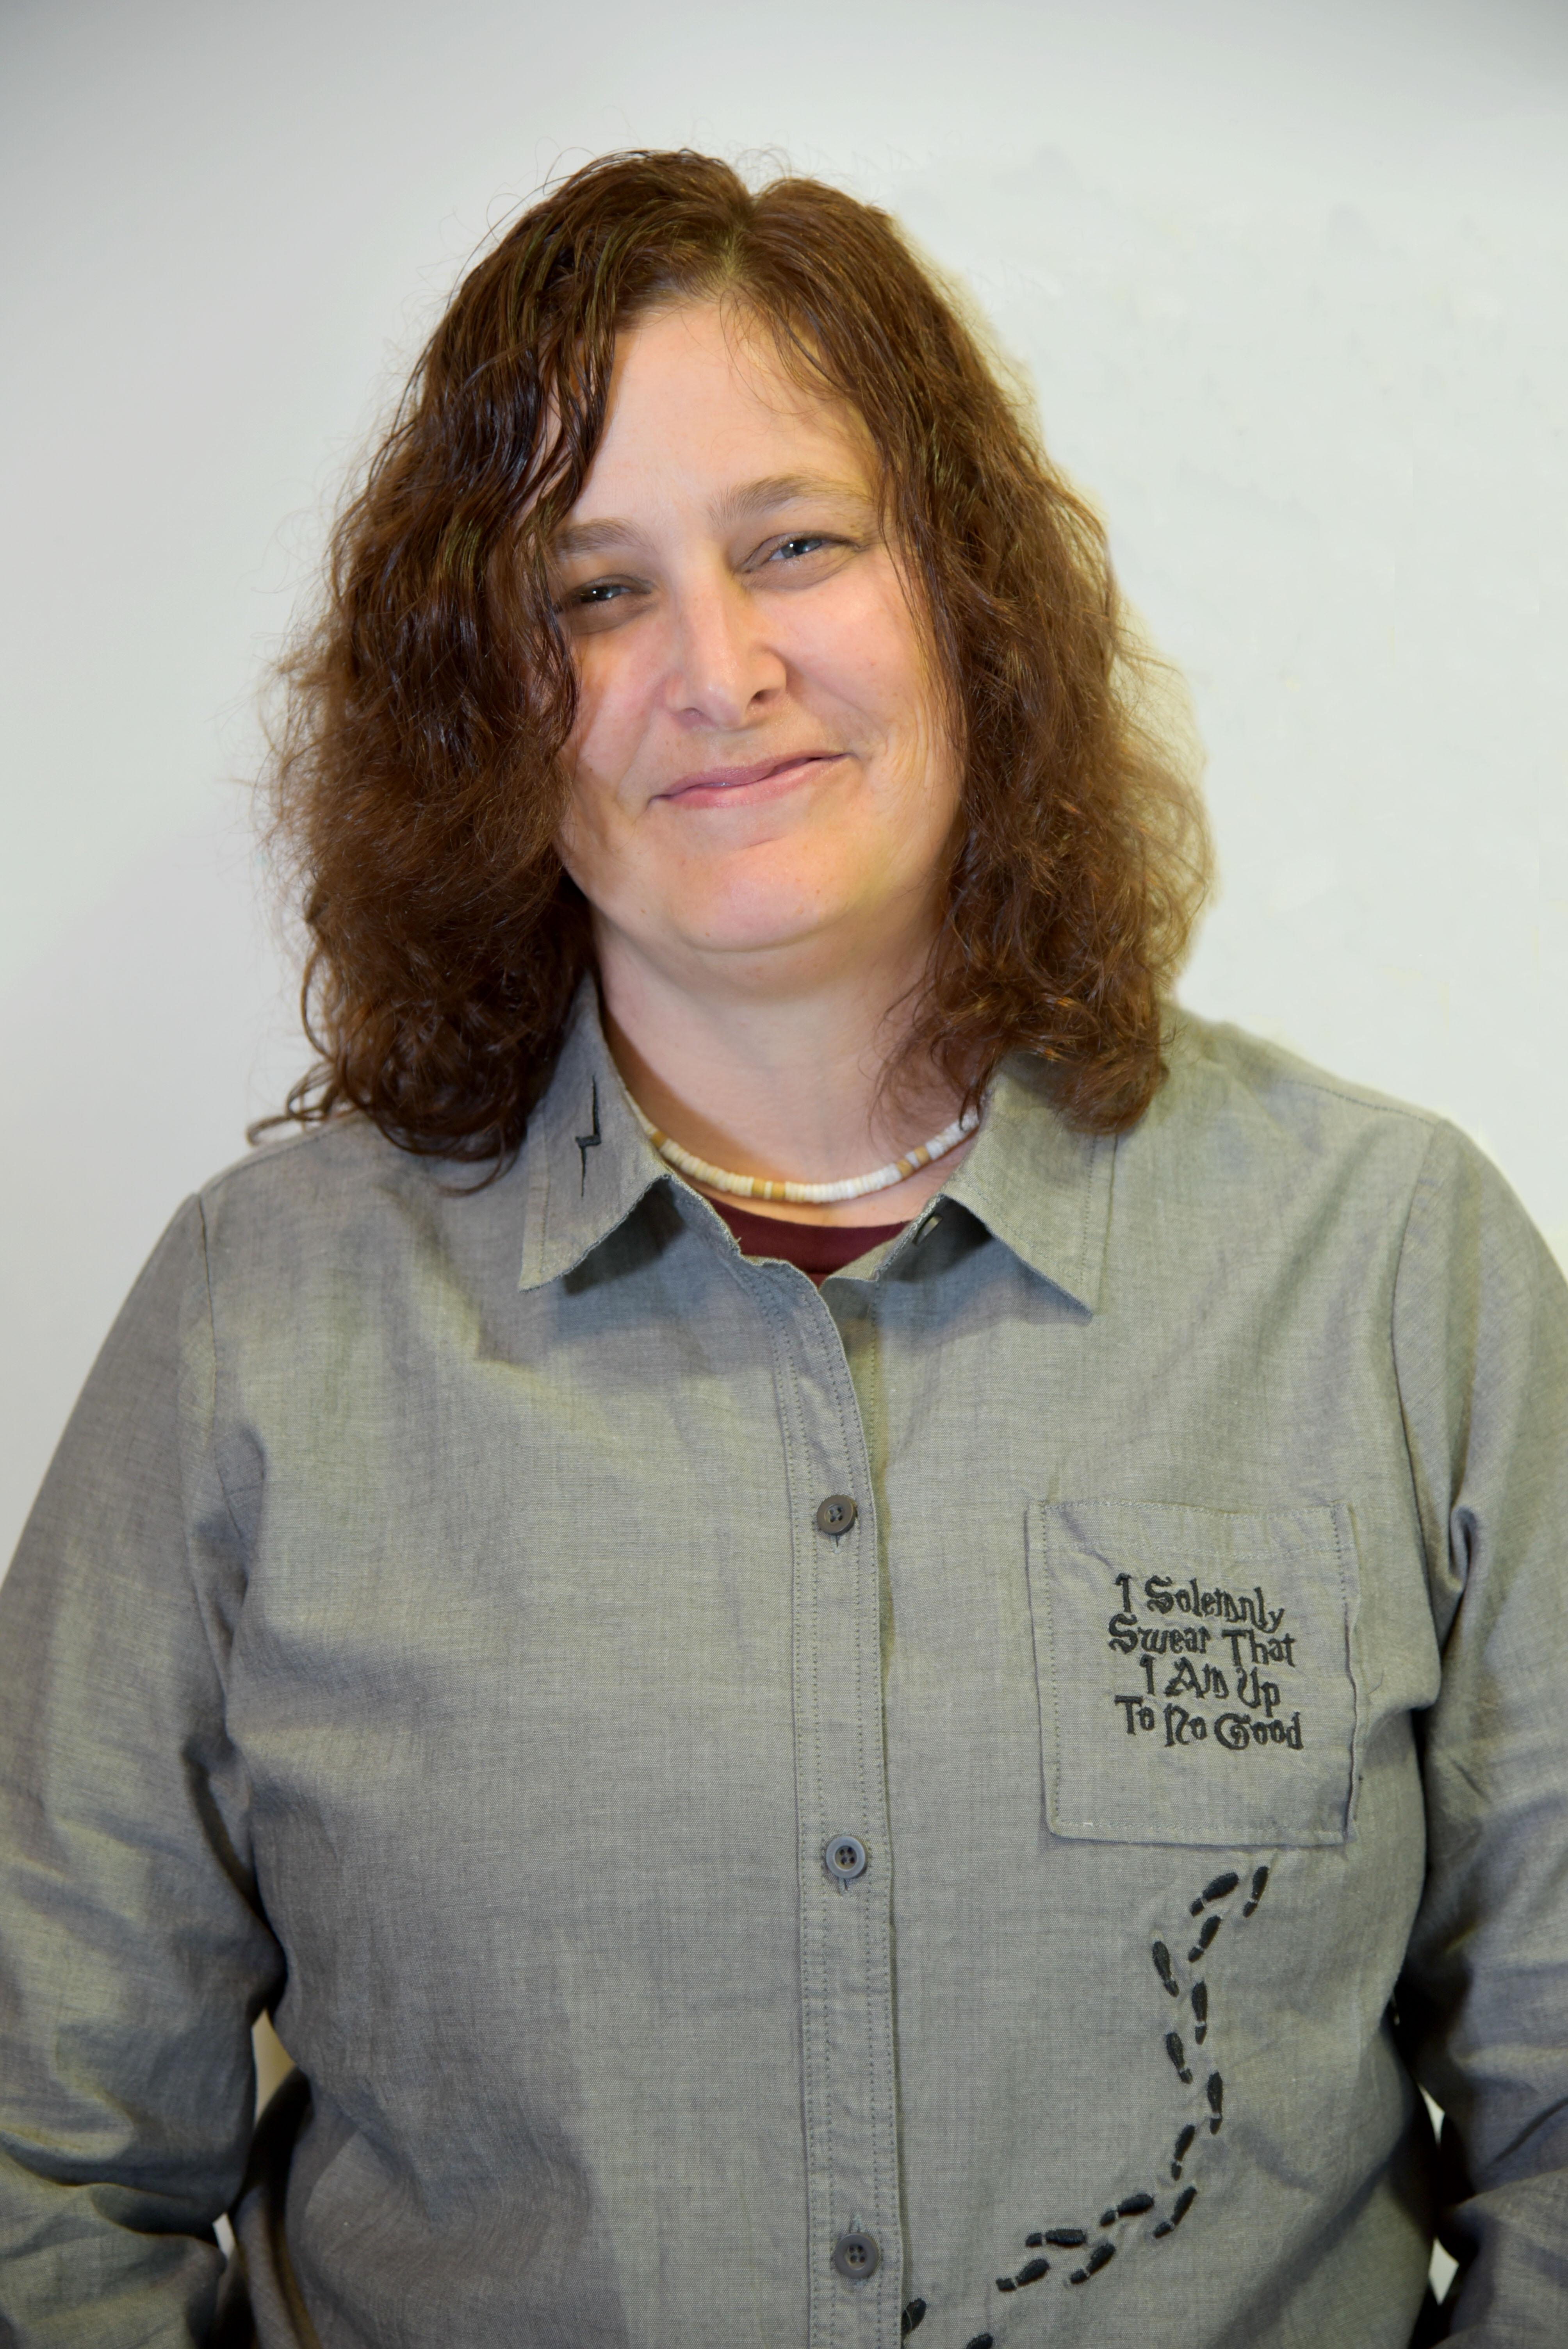 Karin Thorne